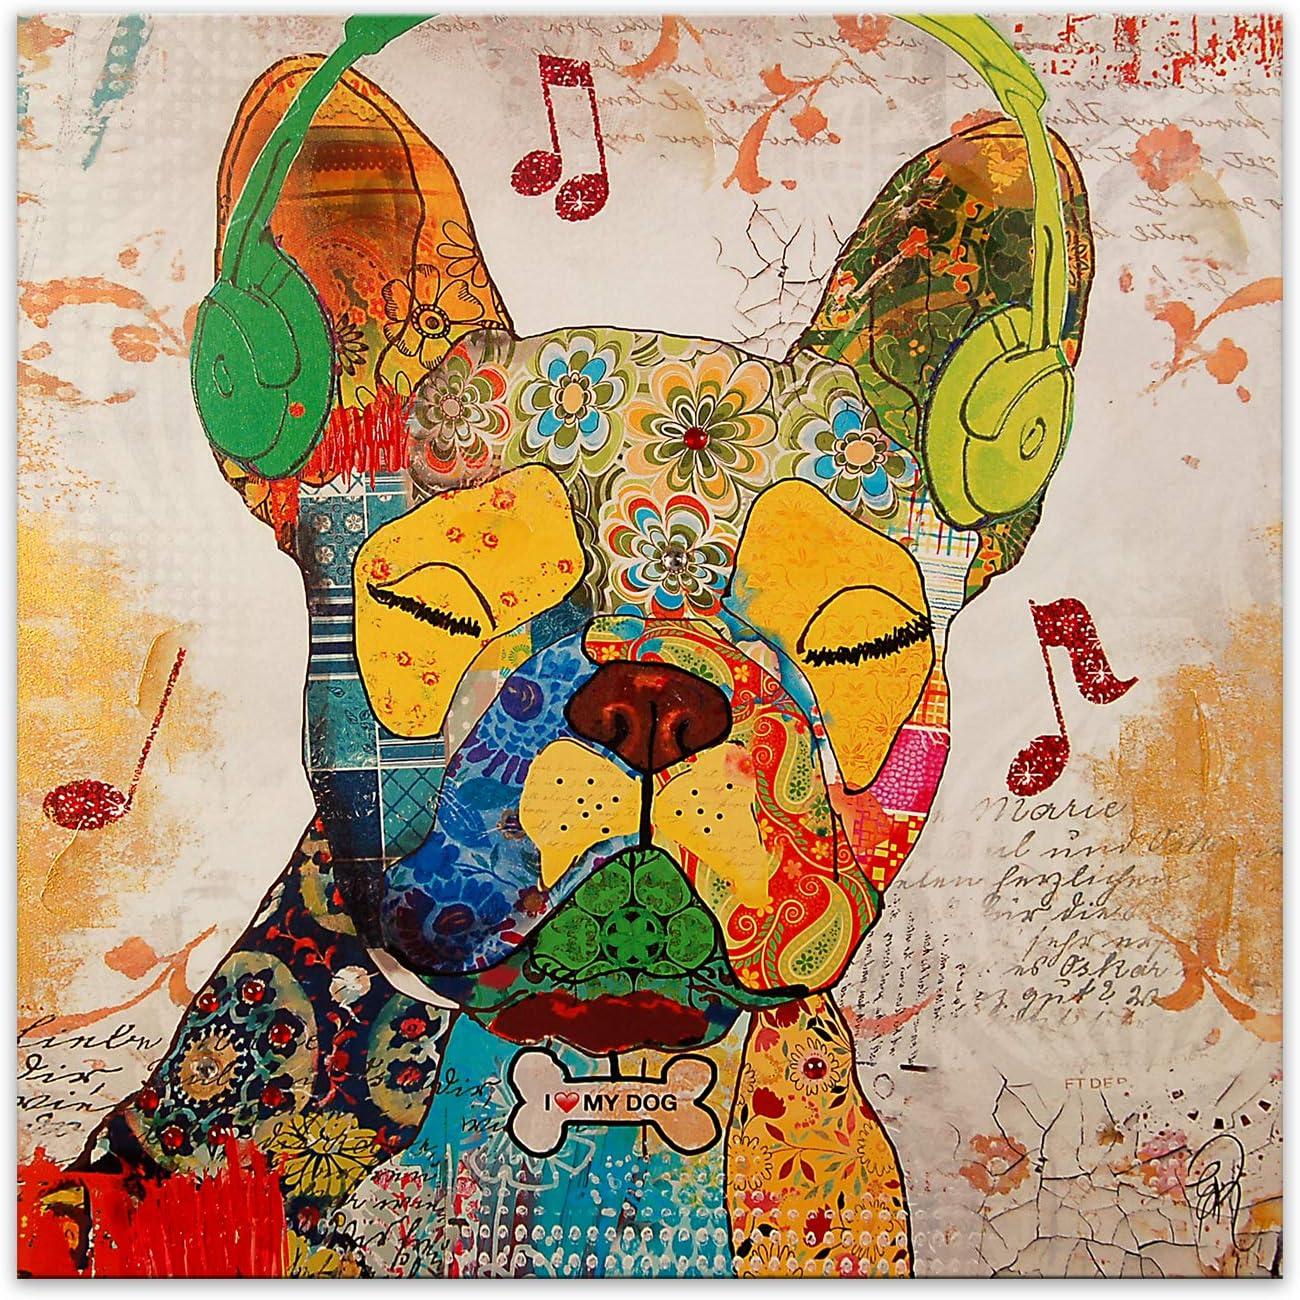 Bulldog francés Pop Art Cuadro, Grabado Moderno sobre Lienzo con Adornos en Relieve Hechos a Mano y montado sobre Bastidor estético Alto AS362X1